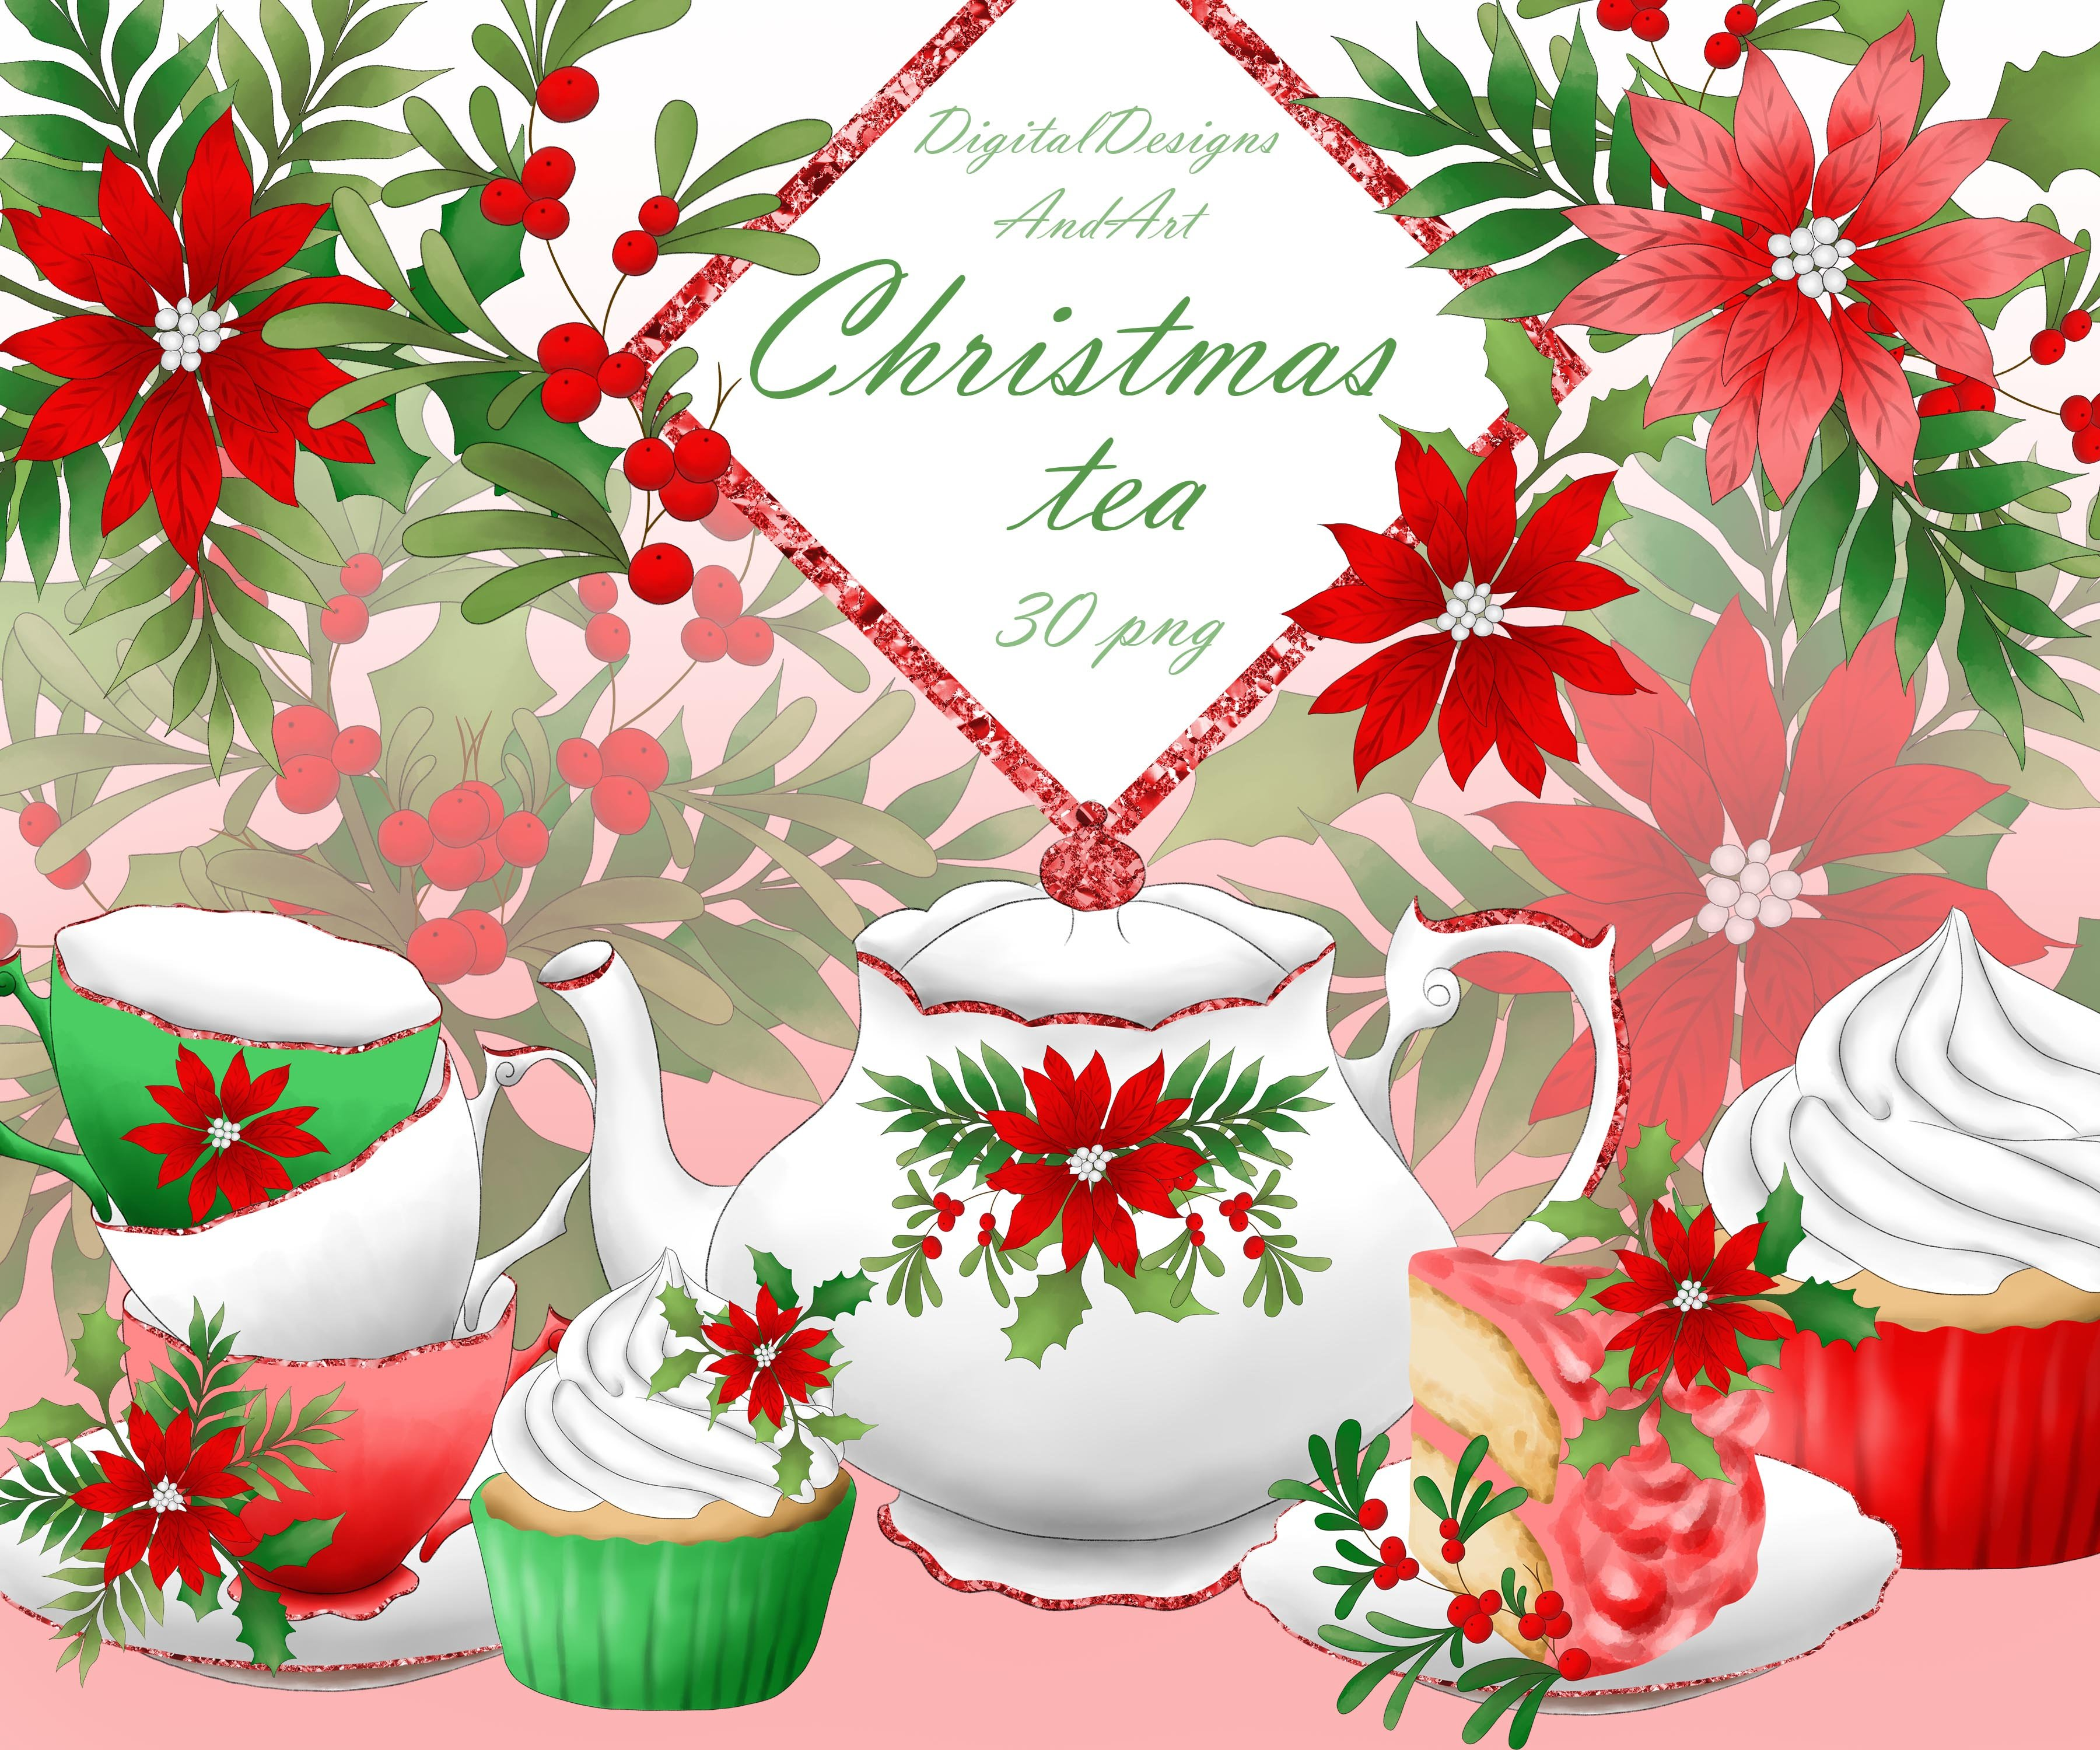 Christmas tea set clipart ~ Illustrations ~ Creative Market